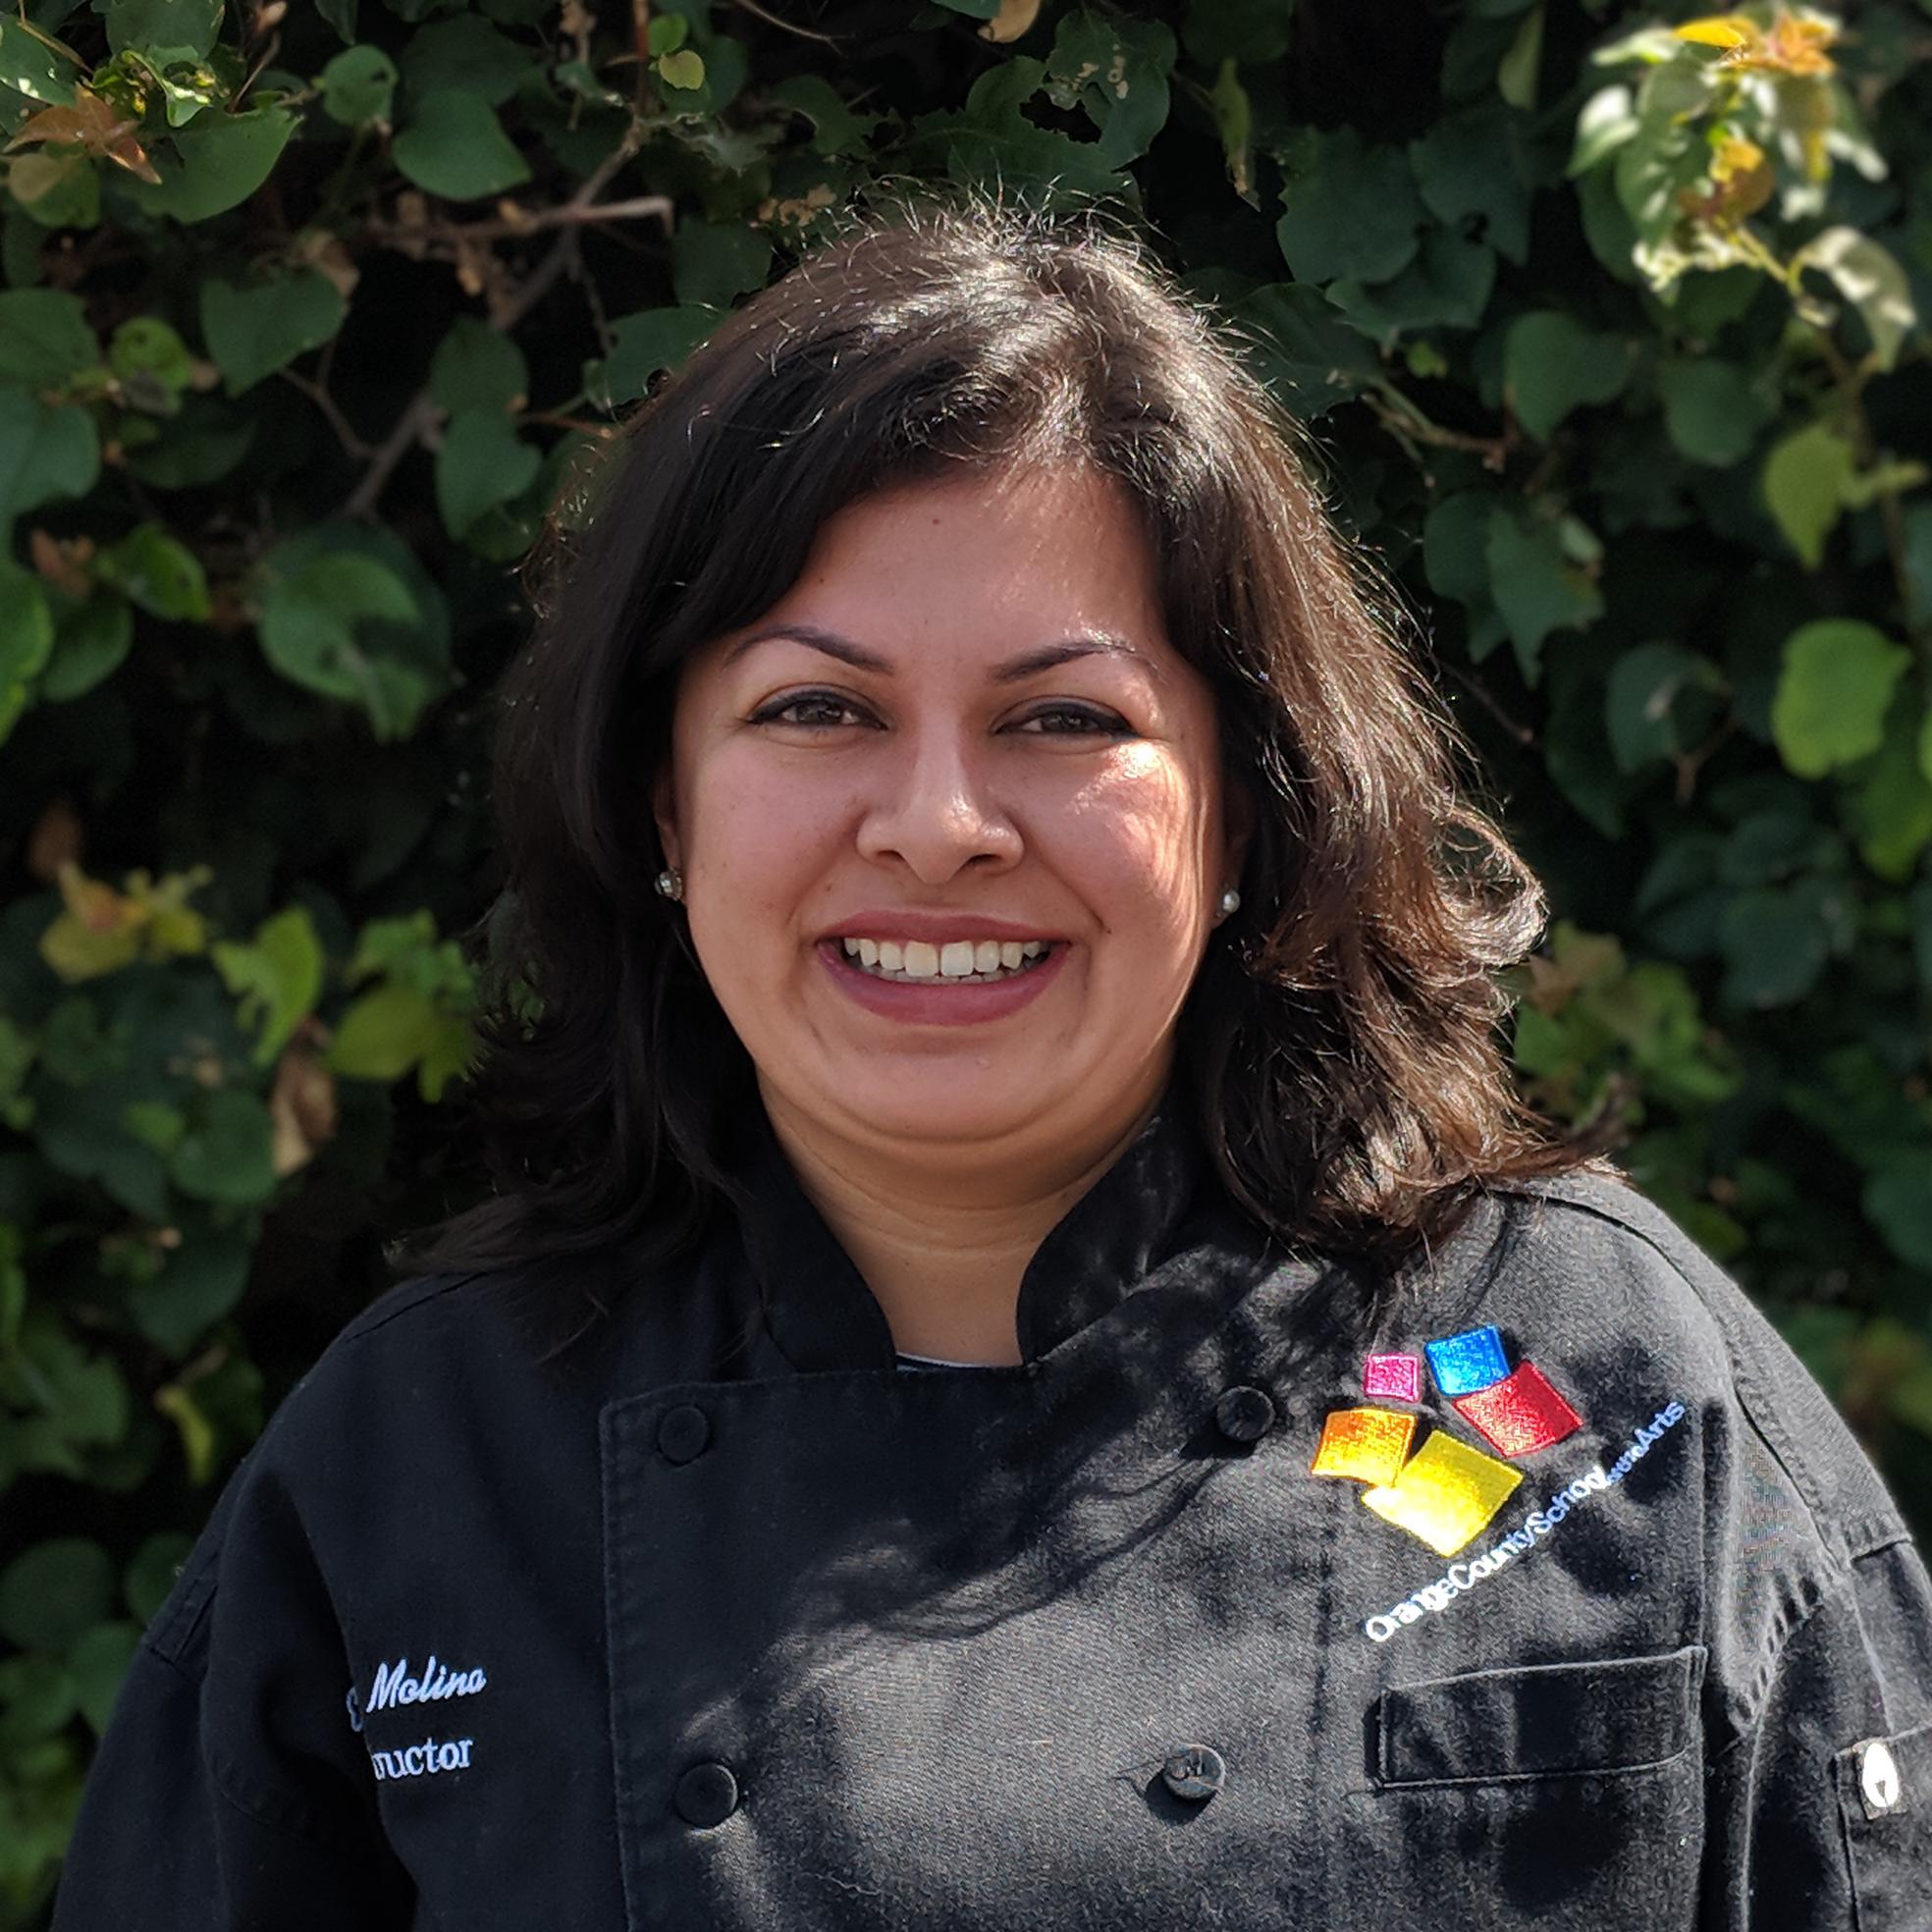 Chef Elizabeth Molina